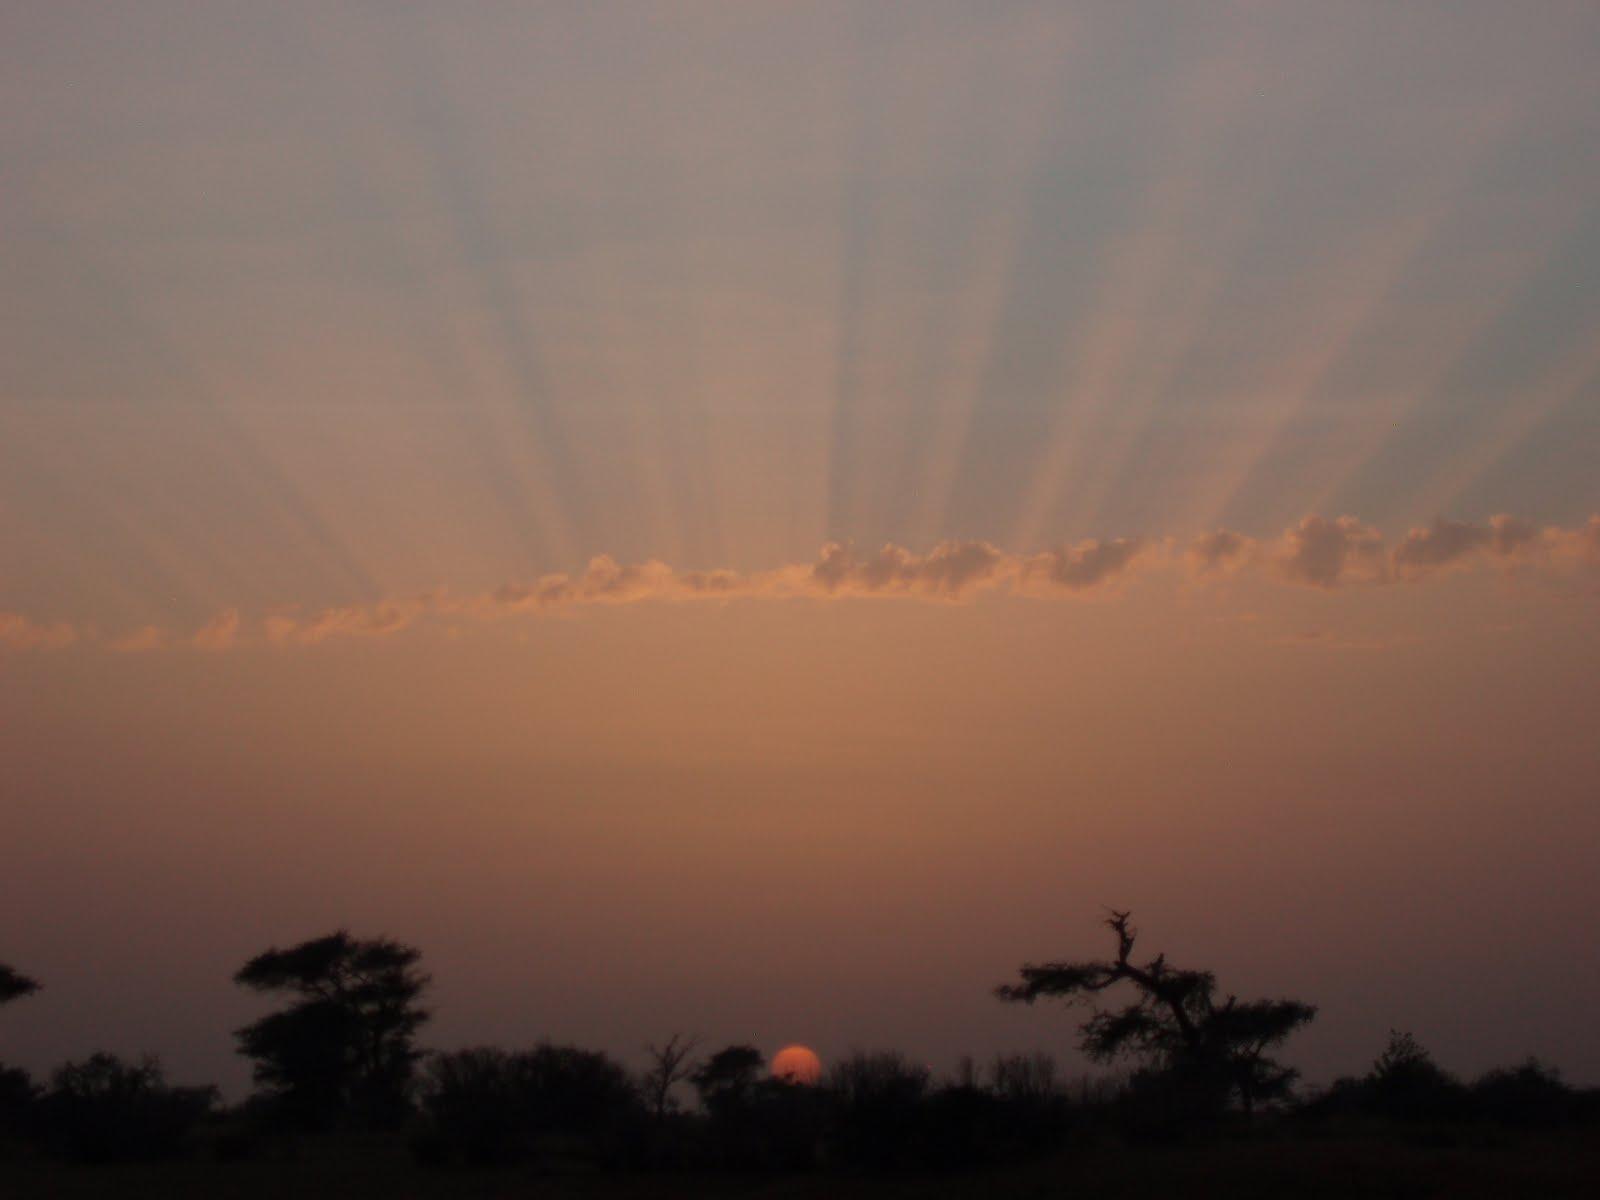 African Sunset - Edge of Sahara, Senegal, West Africa 2009